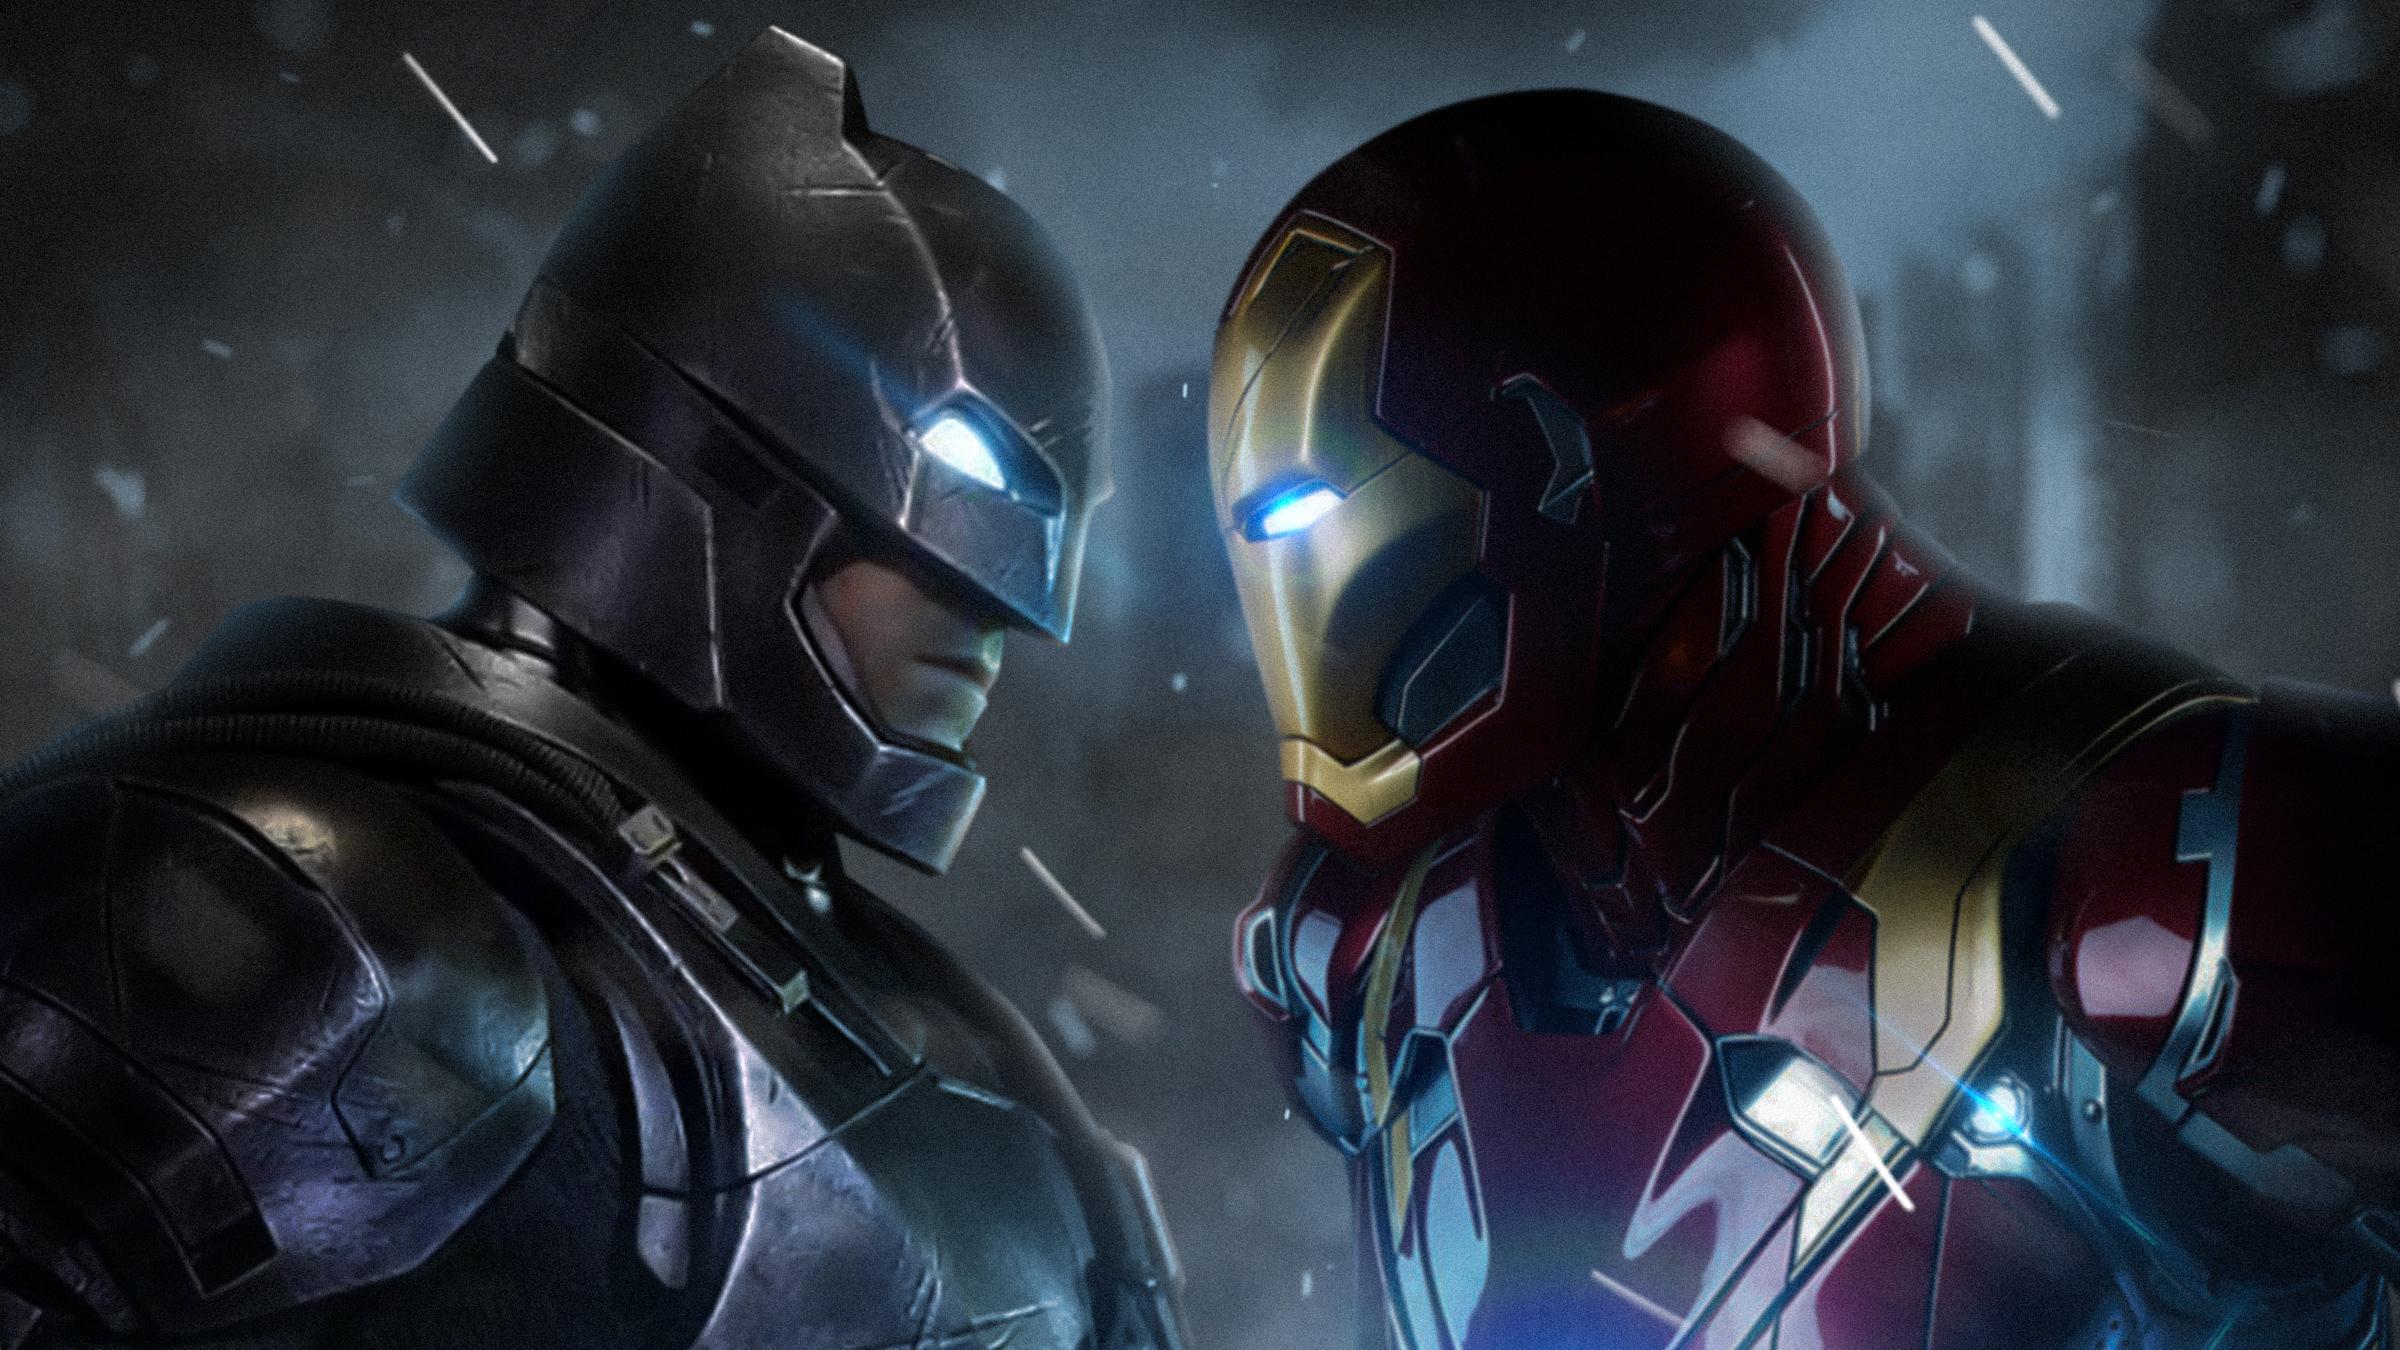 batman vs iron man hd superheroes 4k wallpapers images